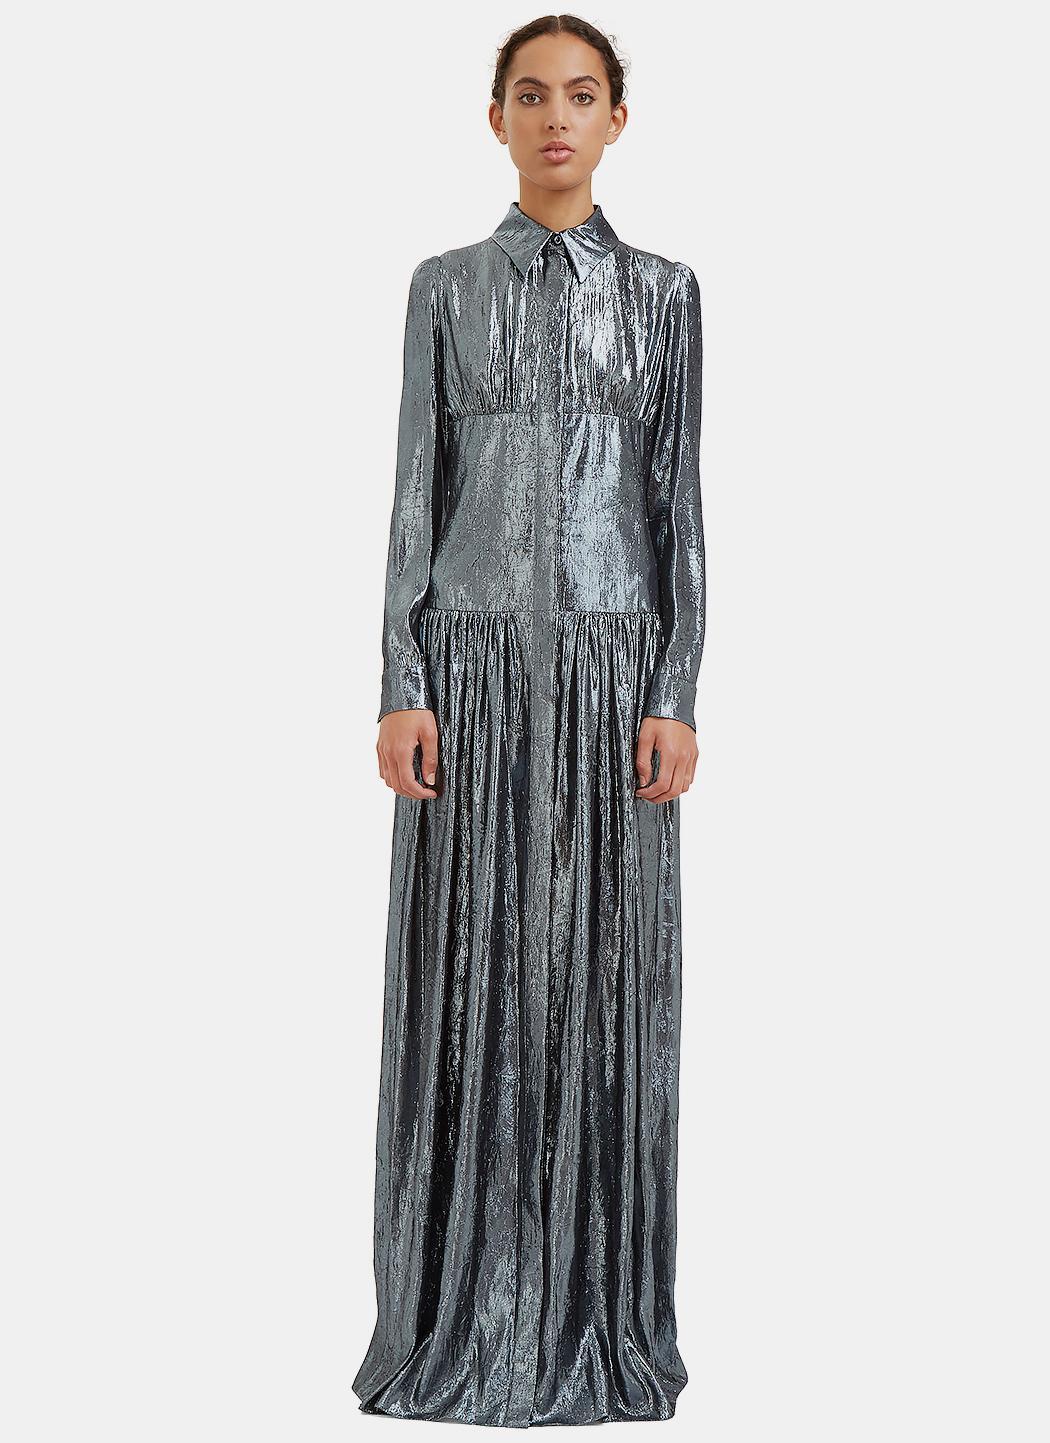 Lanvin Women 39 S Long Metallic Lurex Shirt Dress In Silver